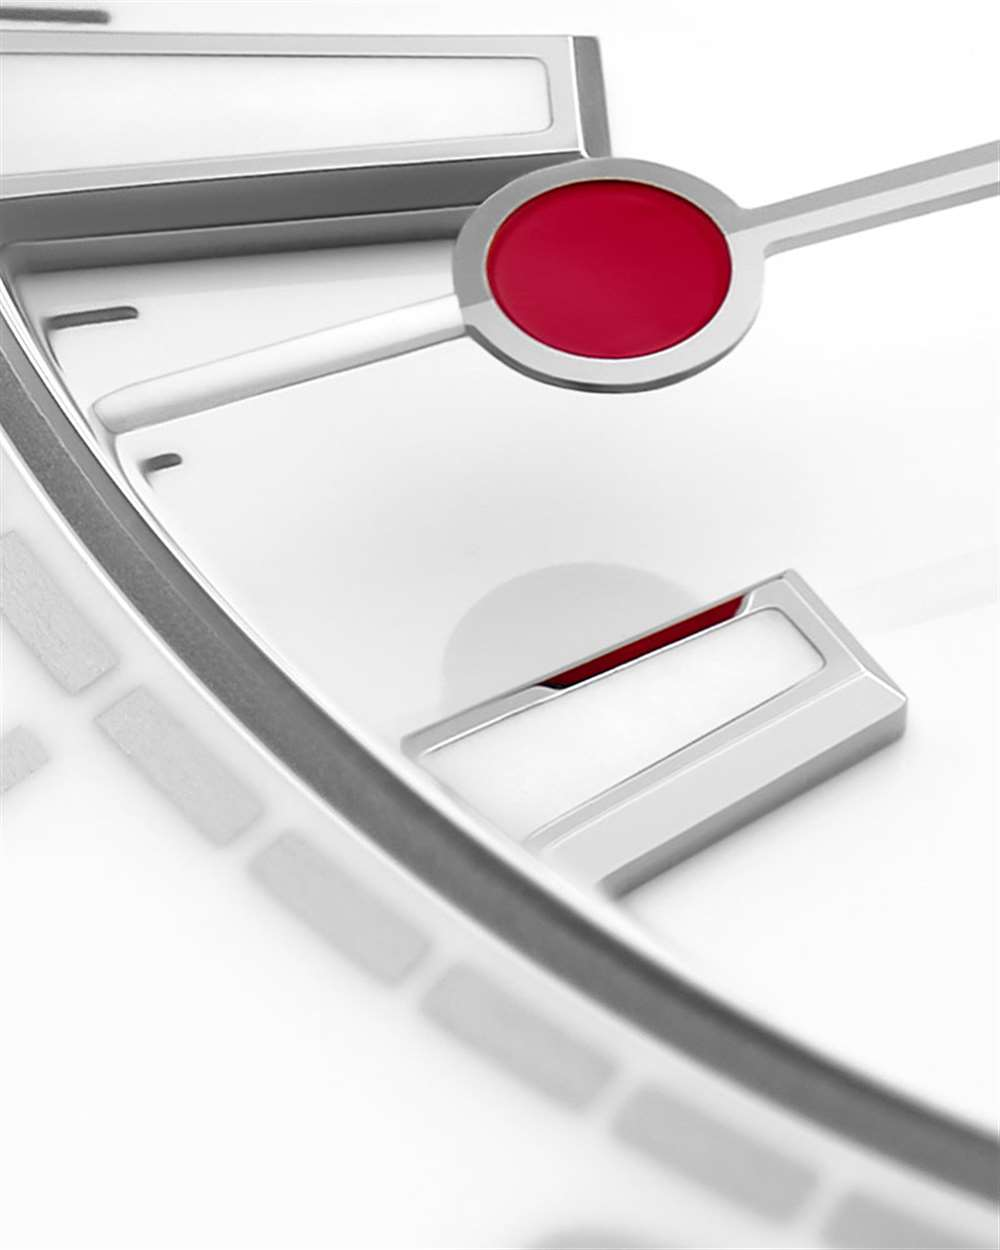 VS厂欧米茄海马150东京奥运2020限量版新品鉴赏